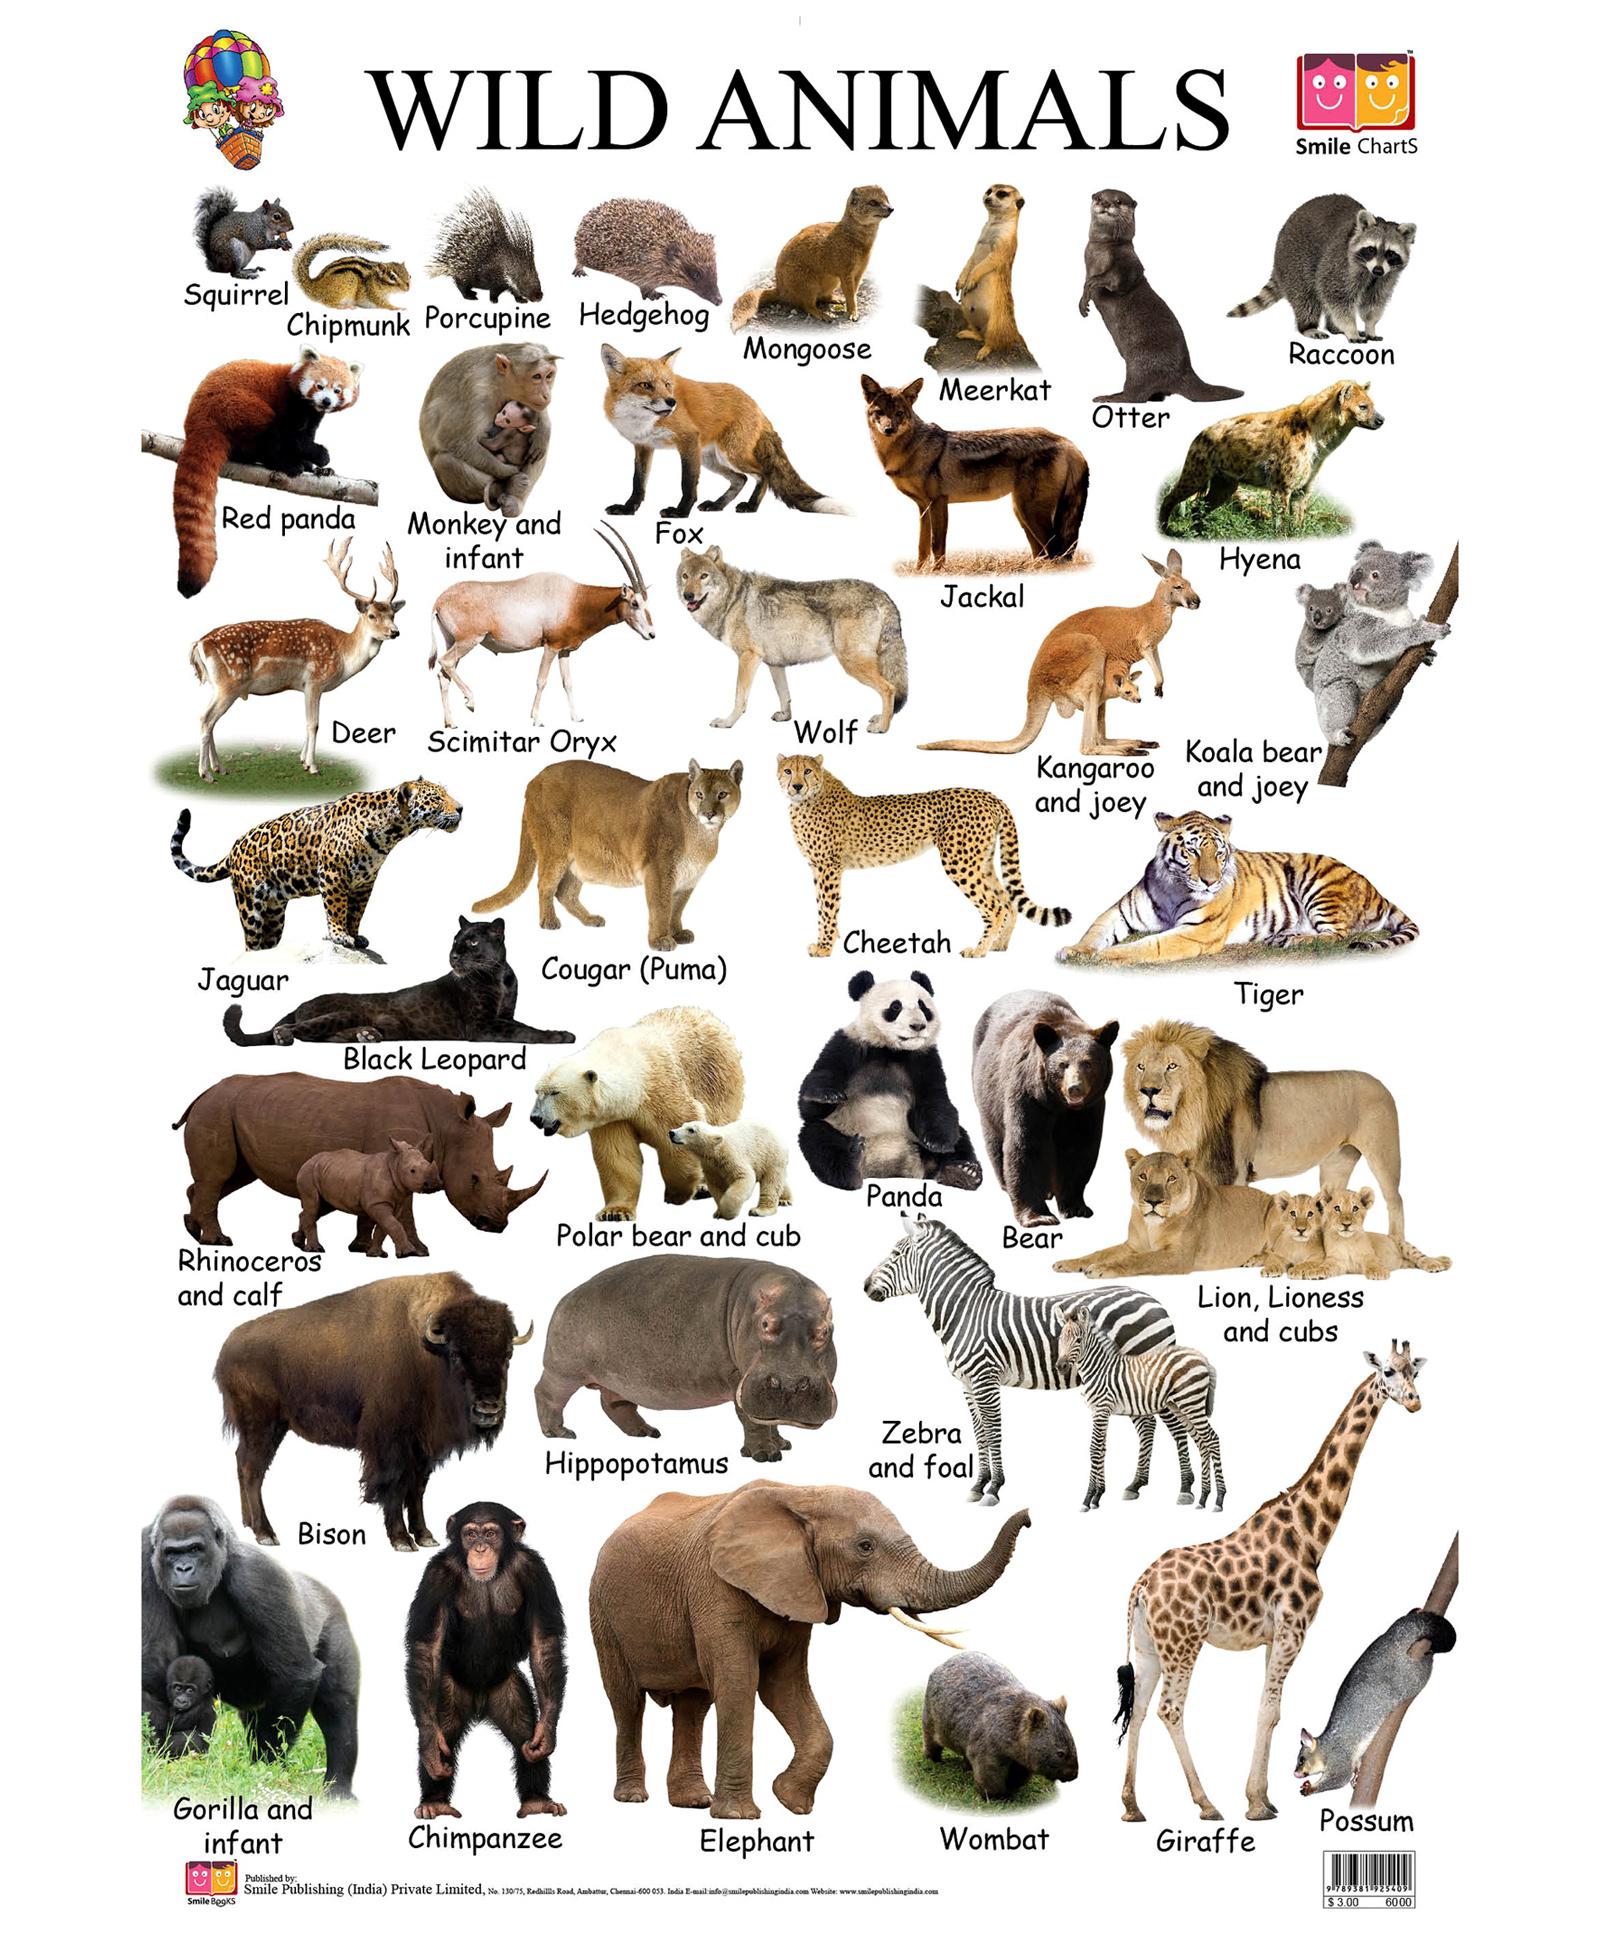 How to name an animal 99